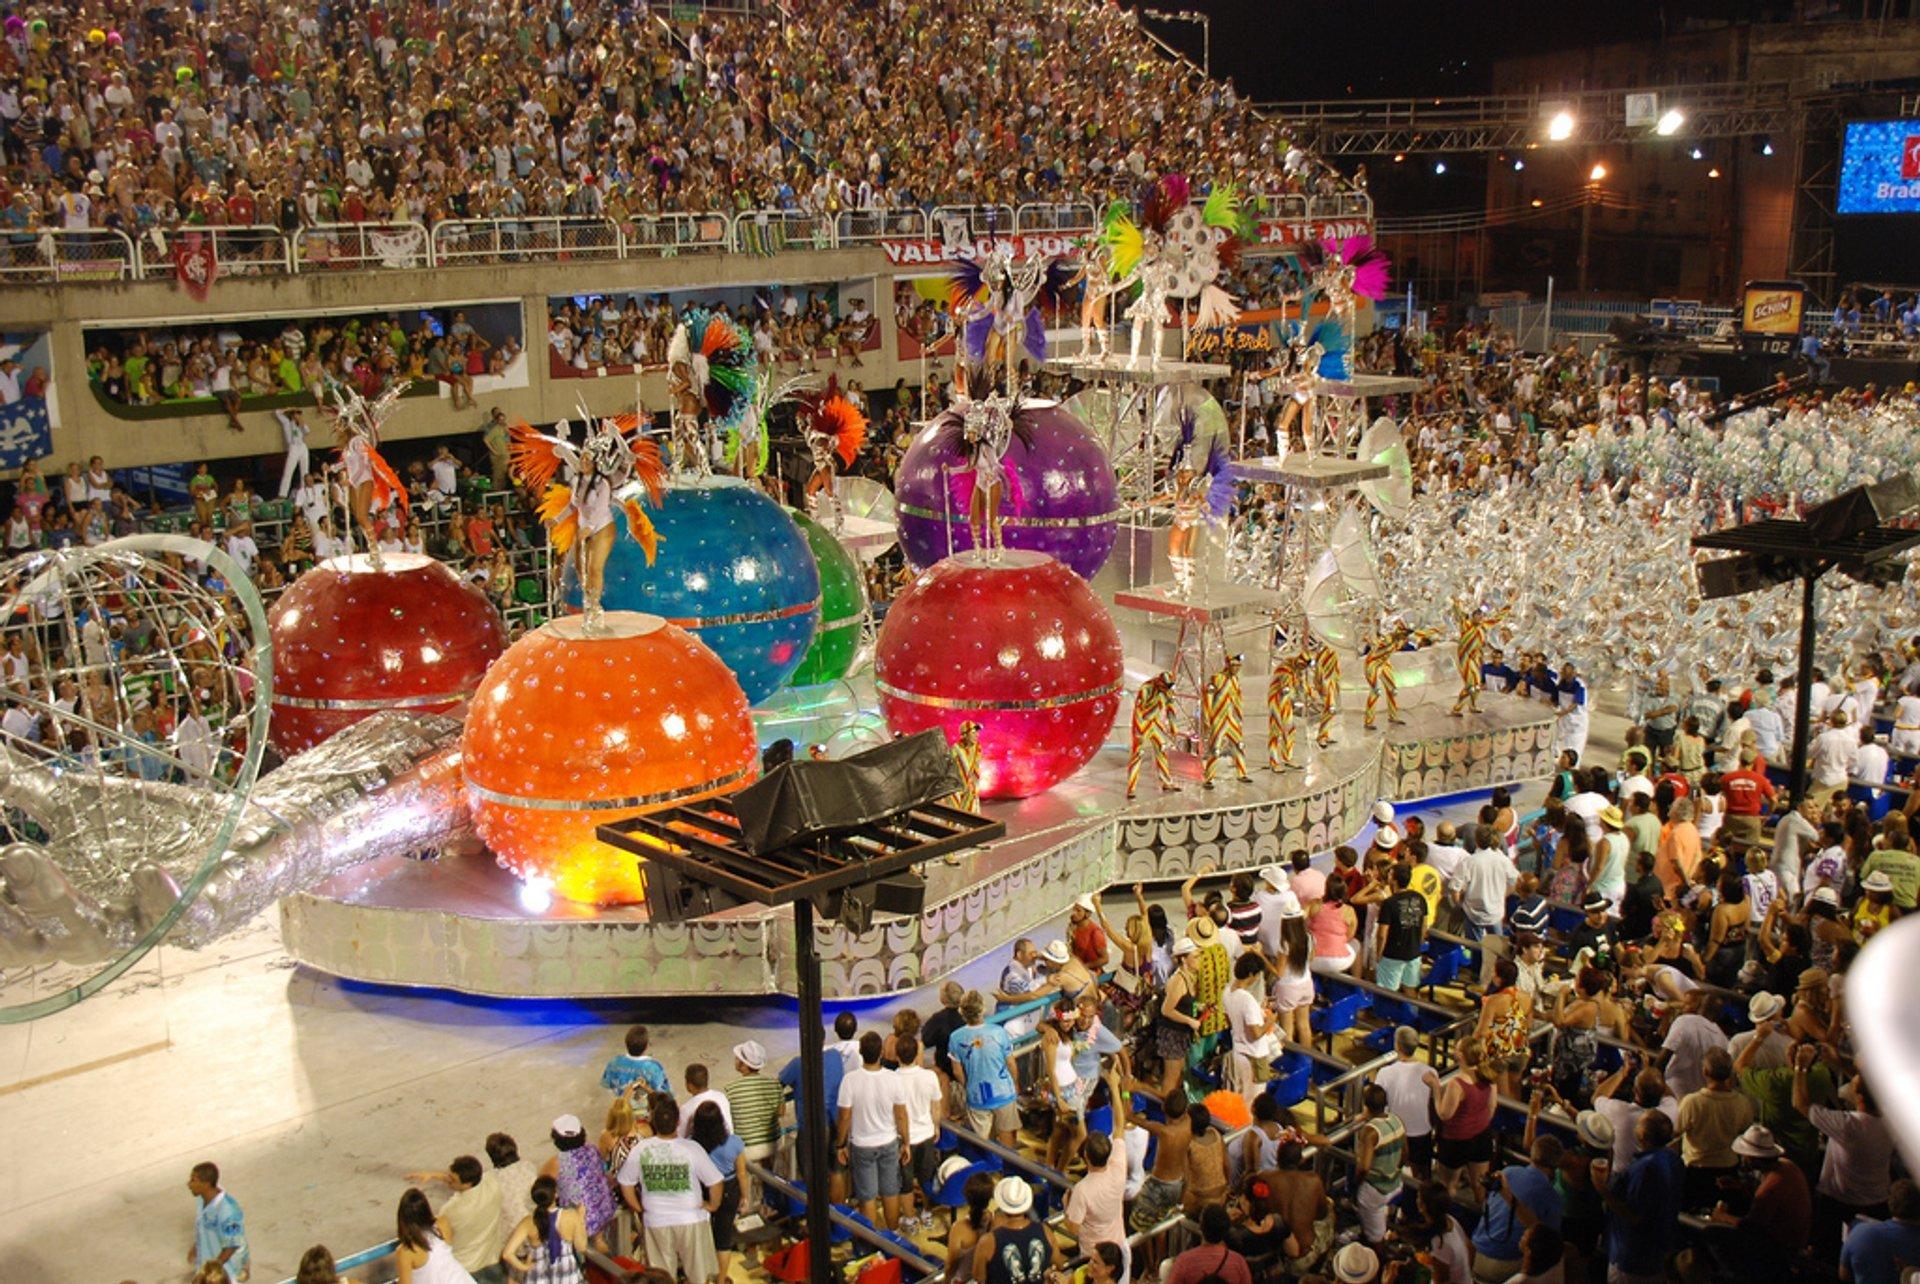 Best time for Rio Carnival in Rio de Janeiro 2019